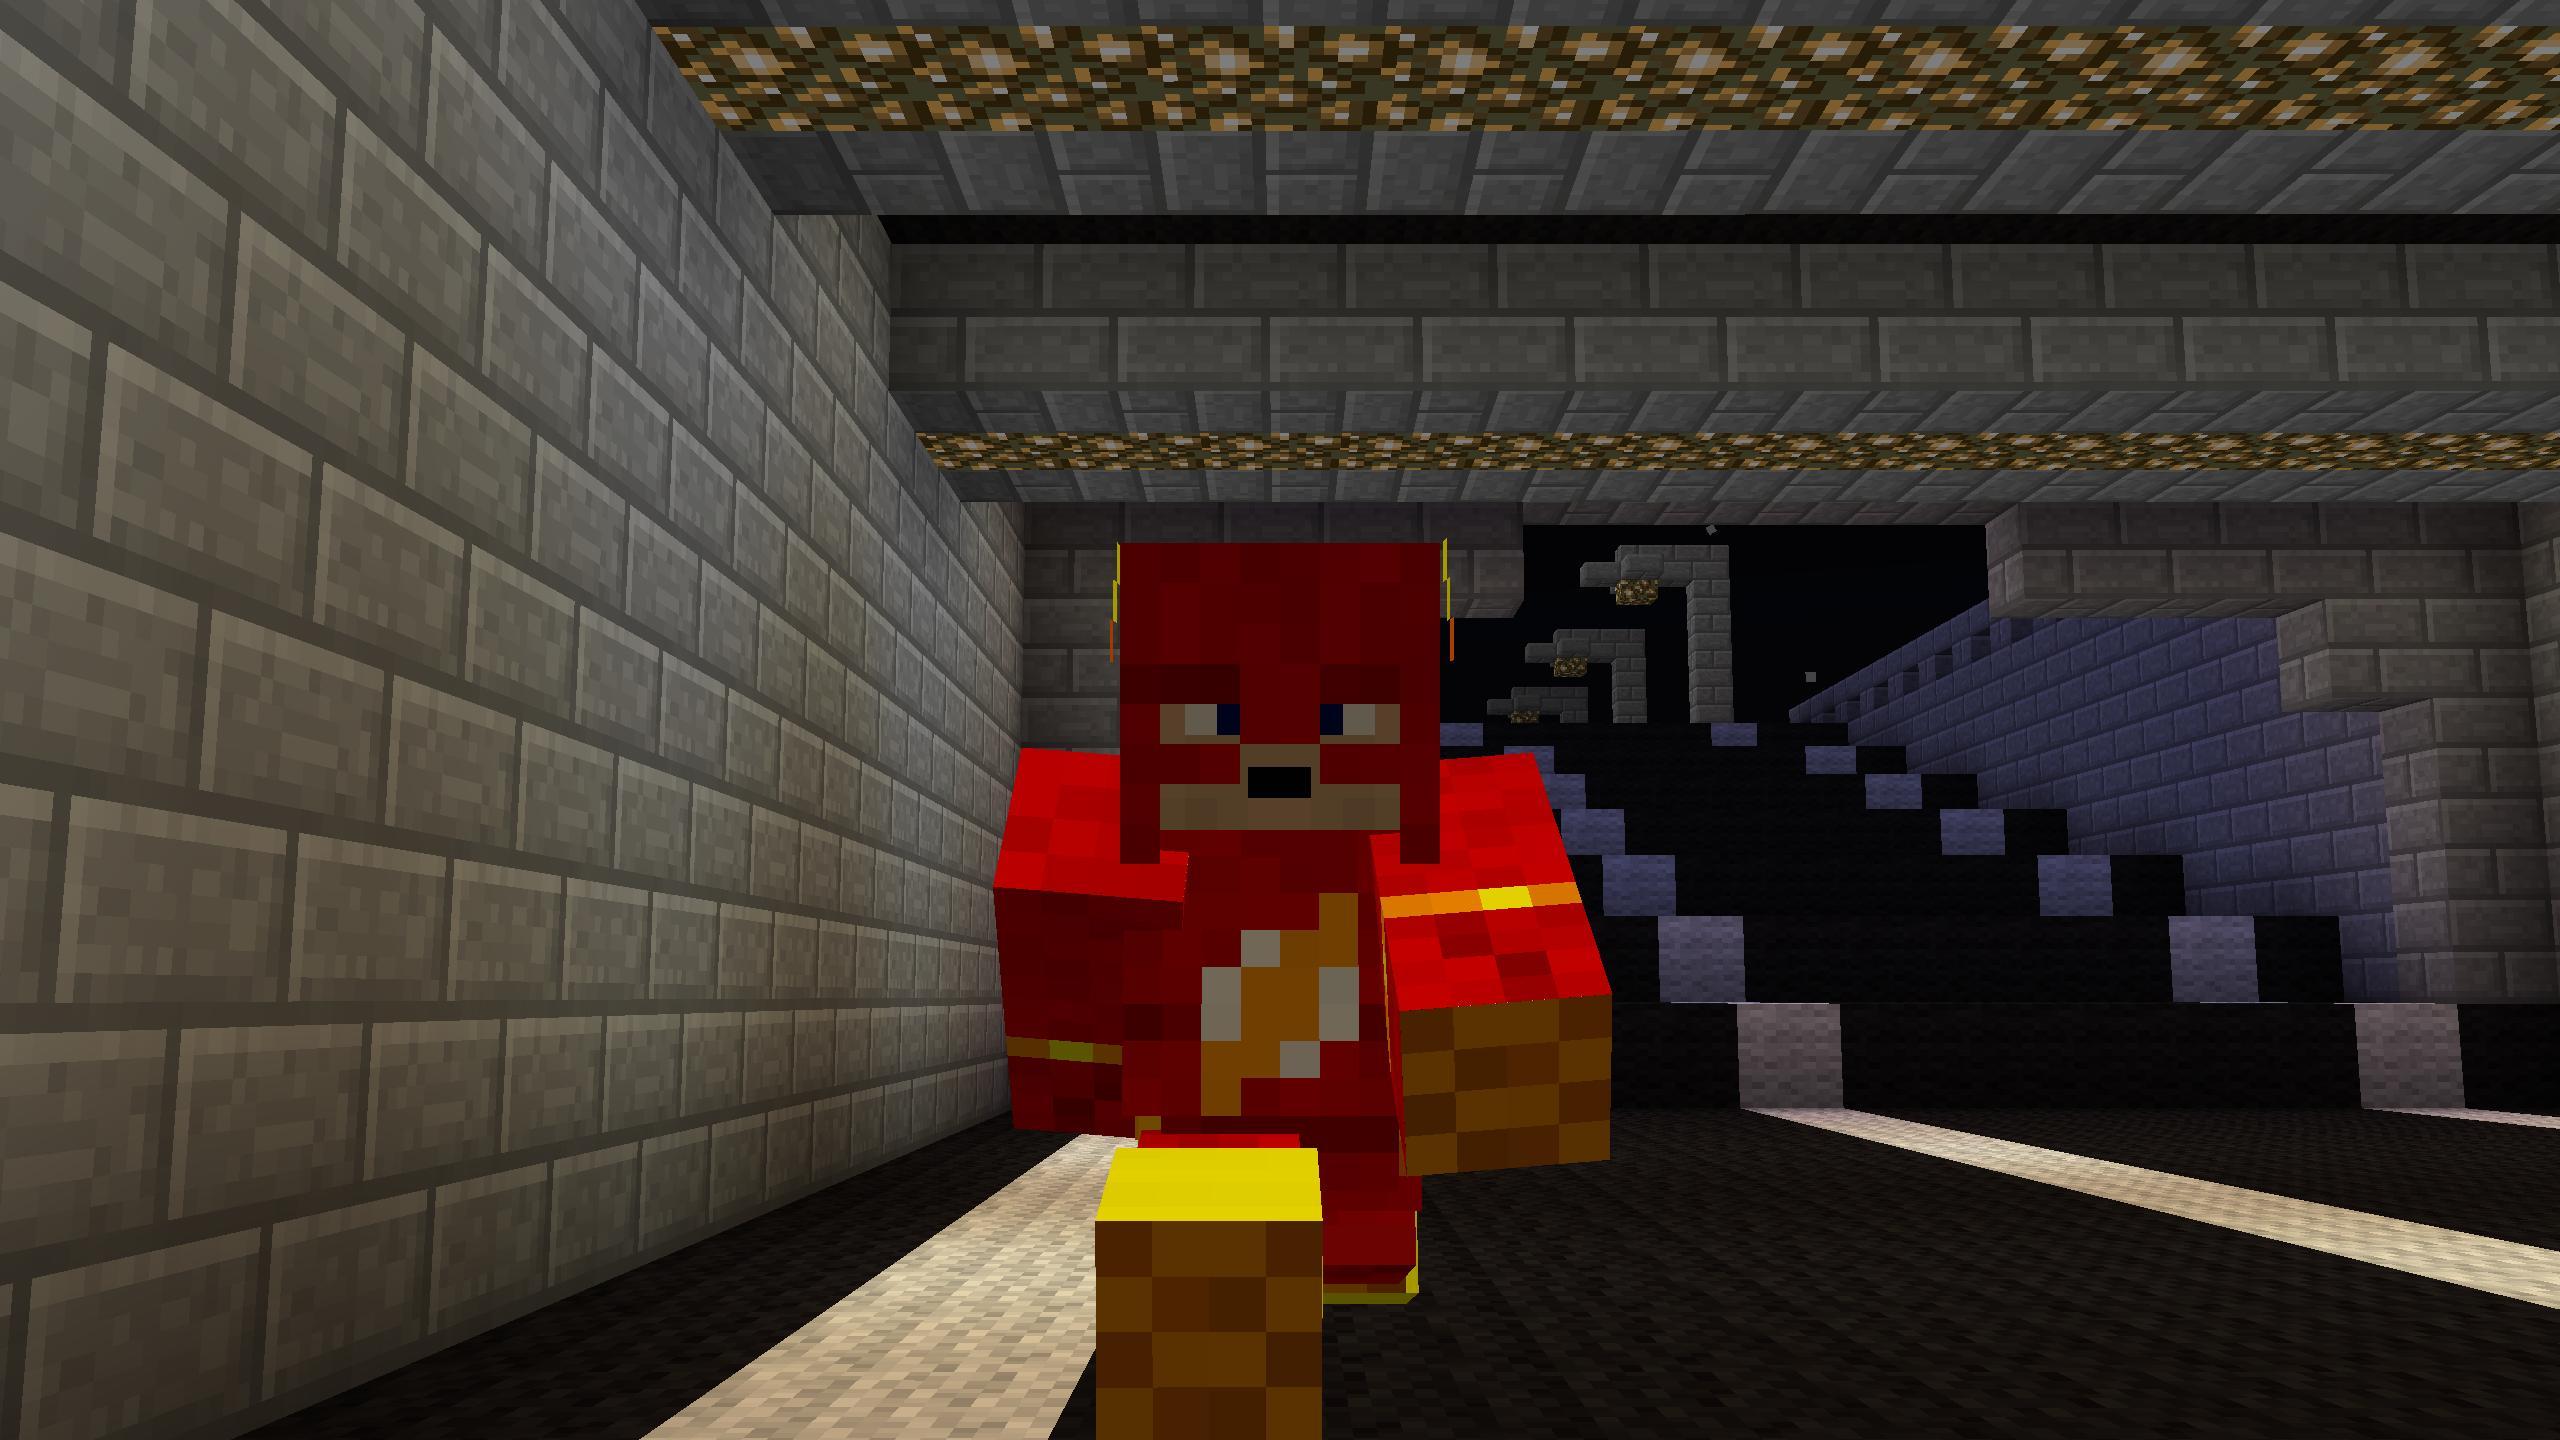 Must see Wallpaper Minecraft Superhero - 636123310688172178  Graphic_743418.jpg